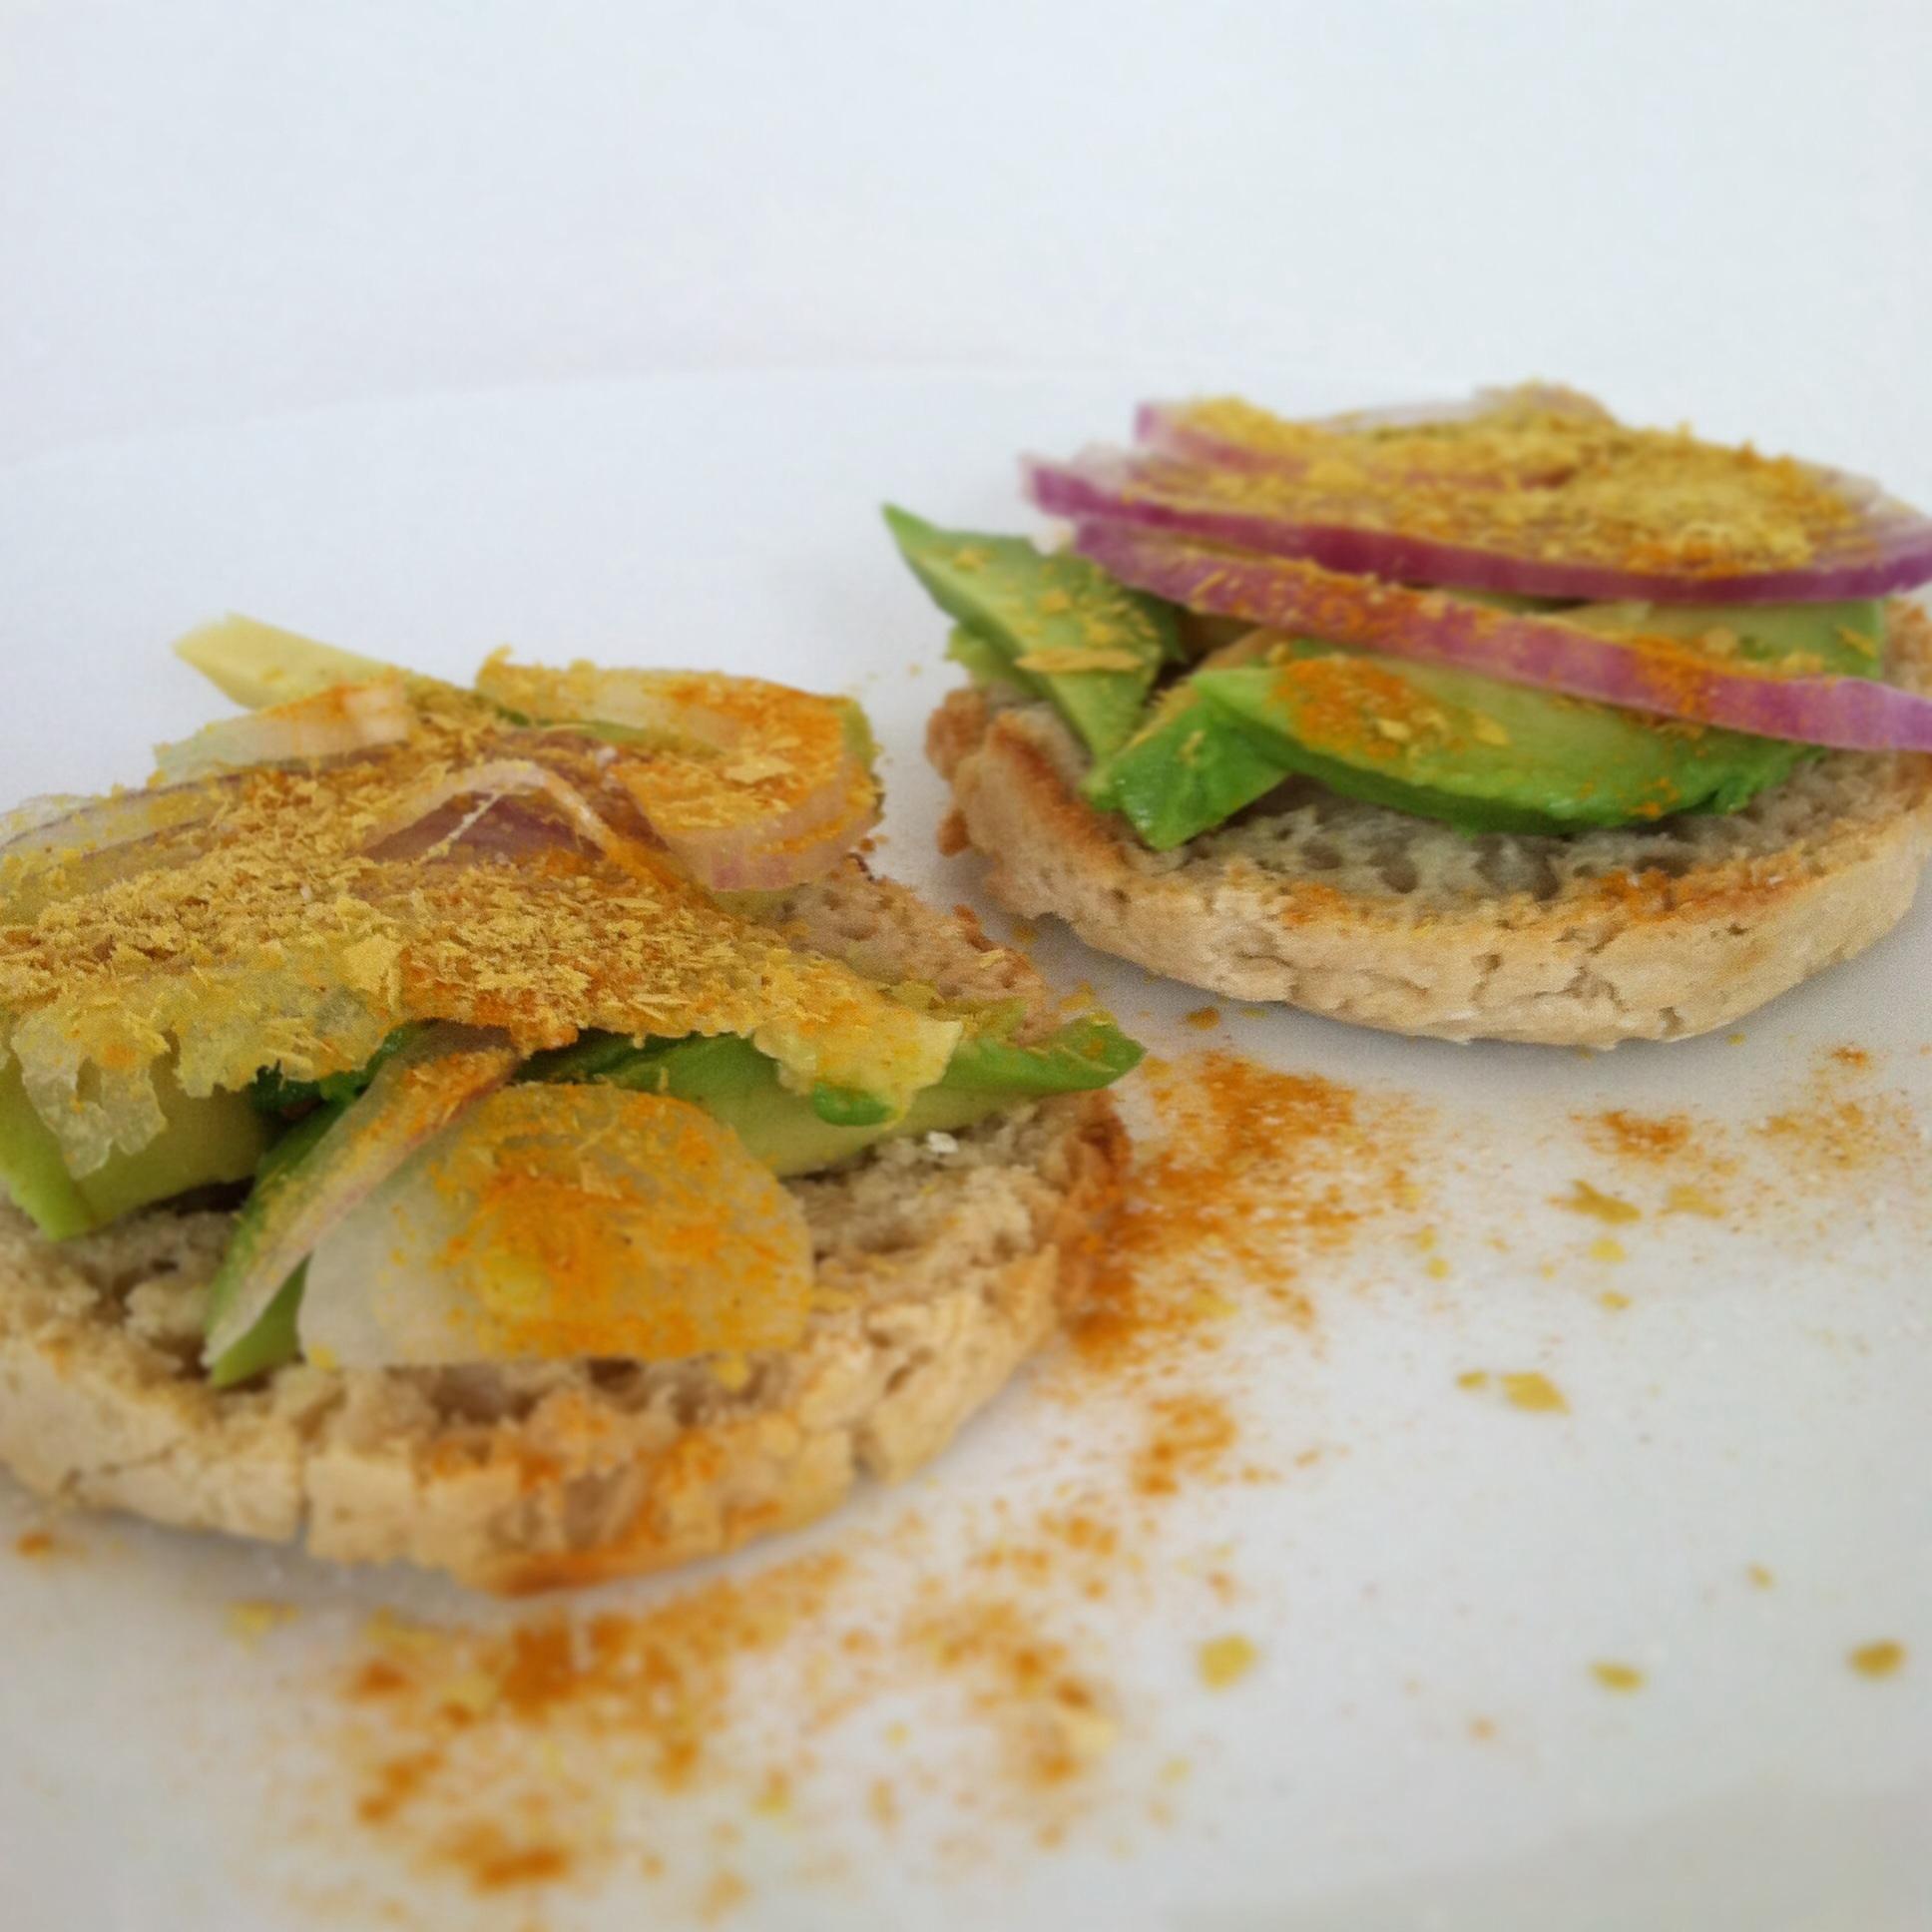 Gluten Free Avocado & Onion English Muffin